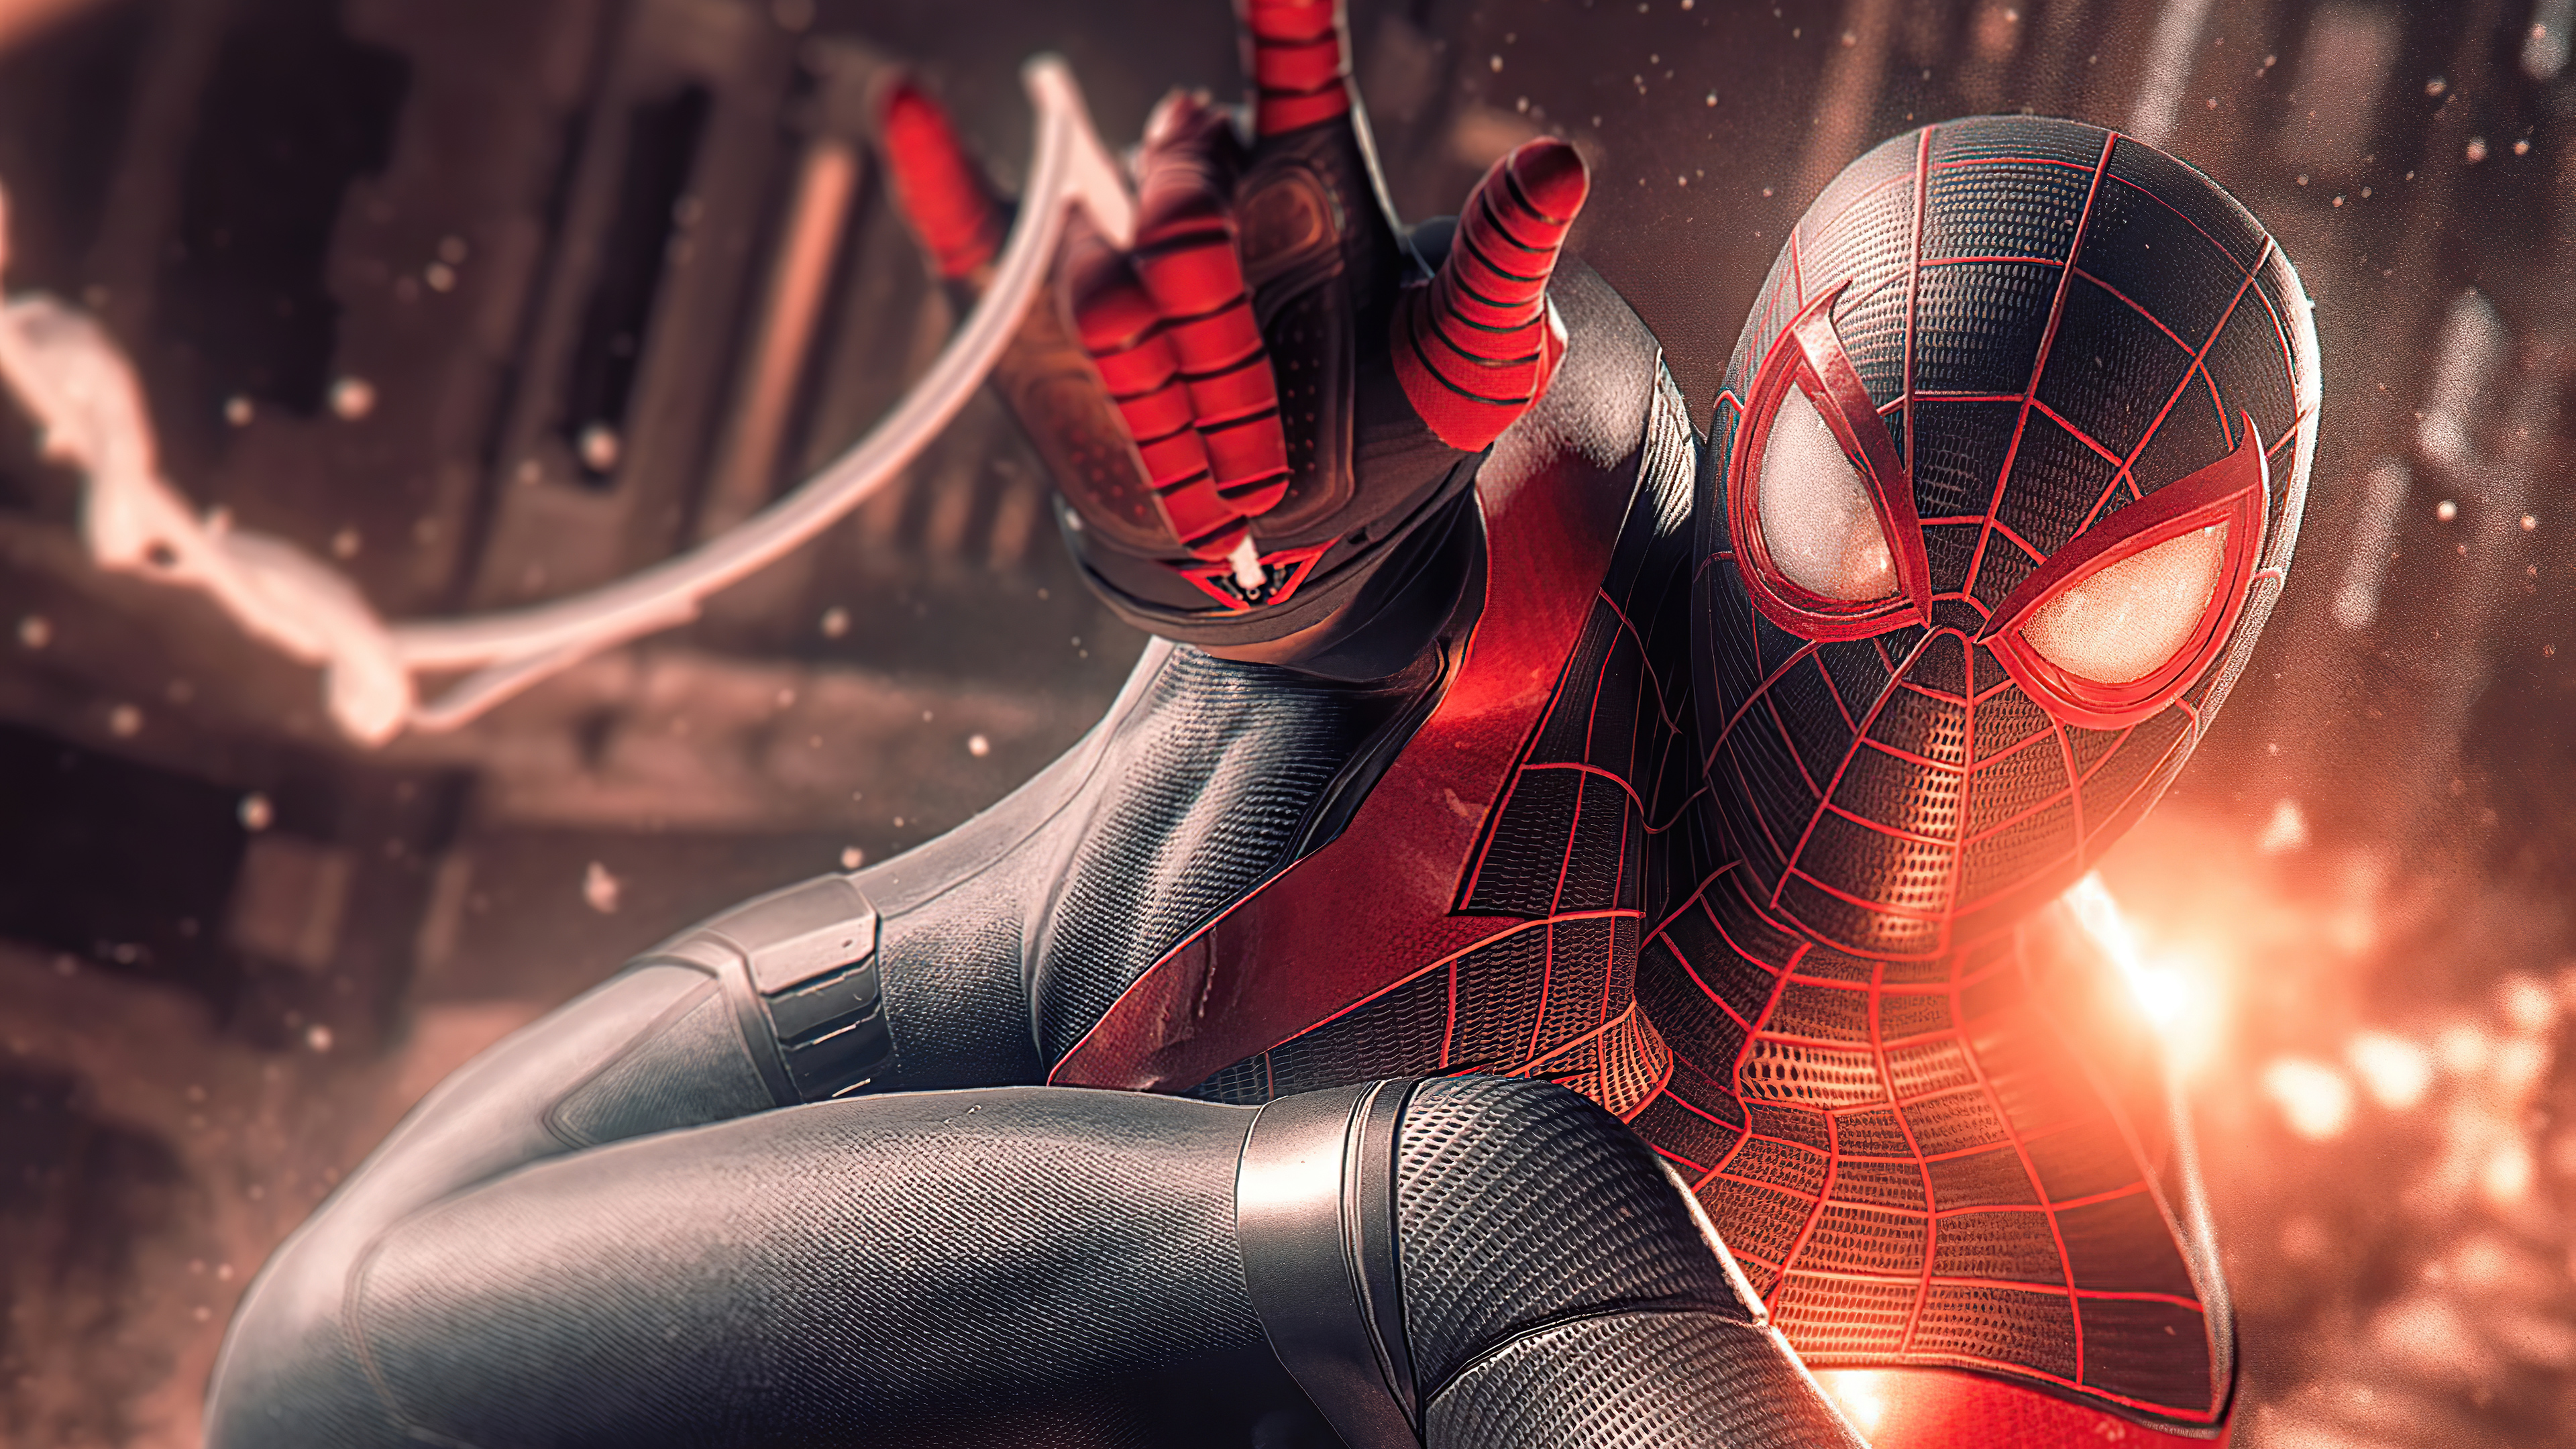 spider man miles morales digital art 4k 1619215238 - Spider Man Miles Morales Digital Art 4k - Spider Man Miles Morales Digital Art 4k wallpapers